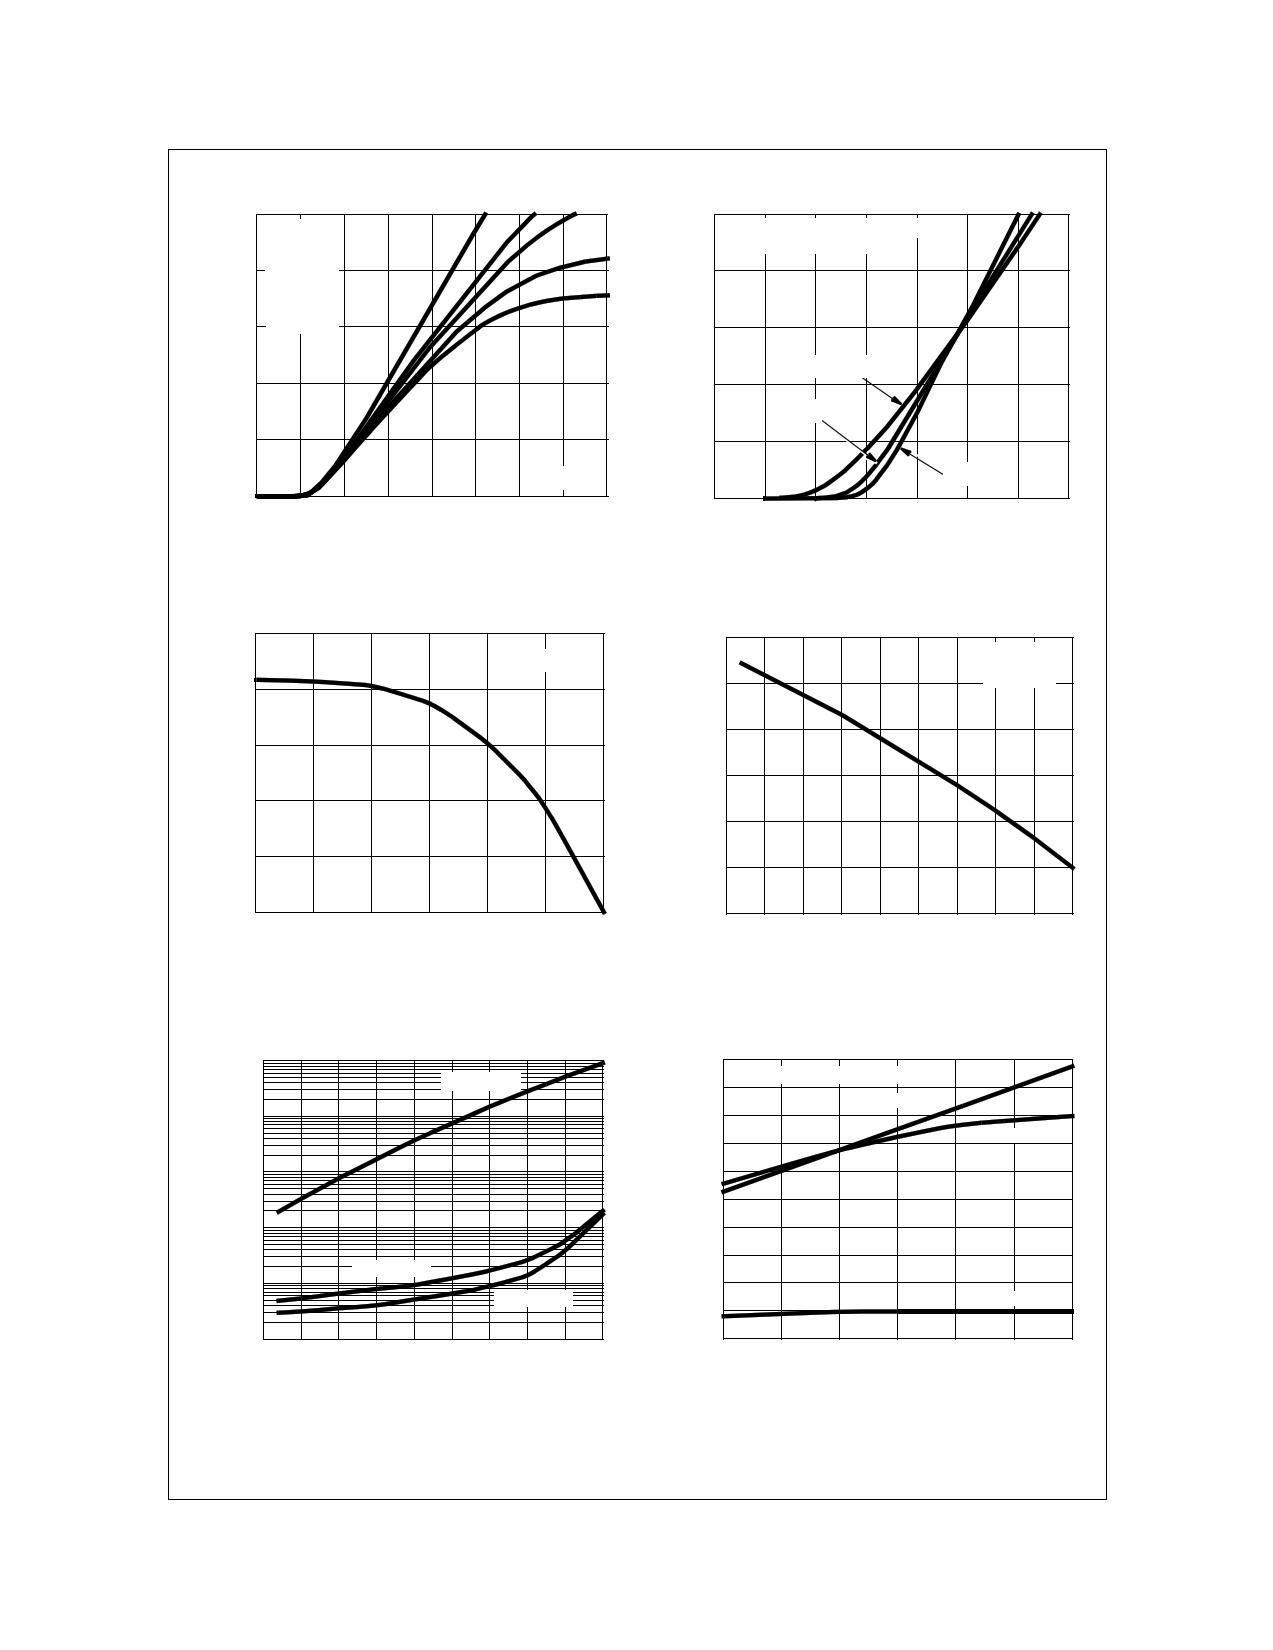 ISL9V3040S3 pdf, 반도체, 판매, 대치품